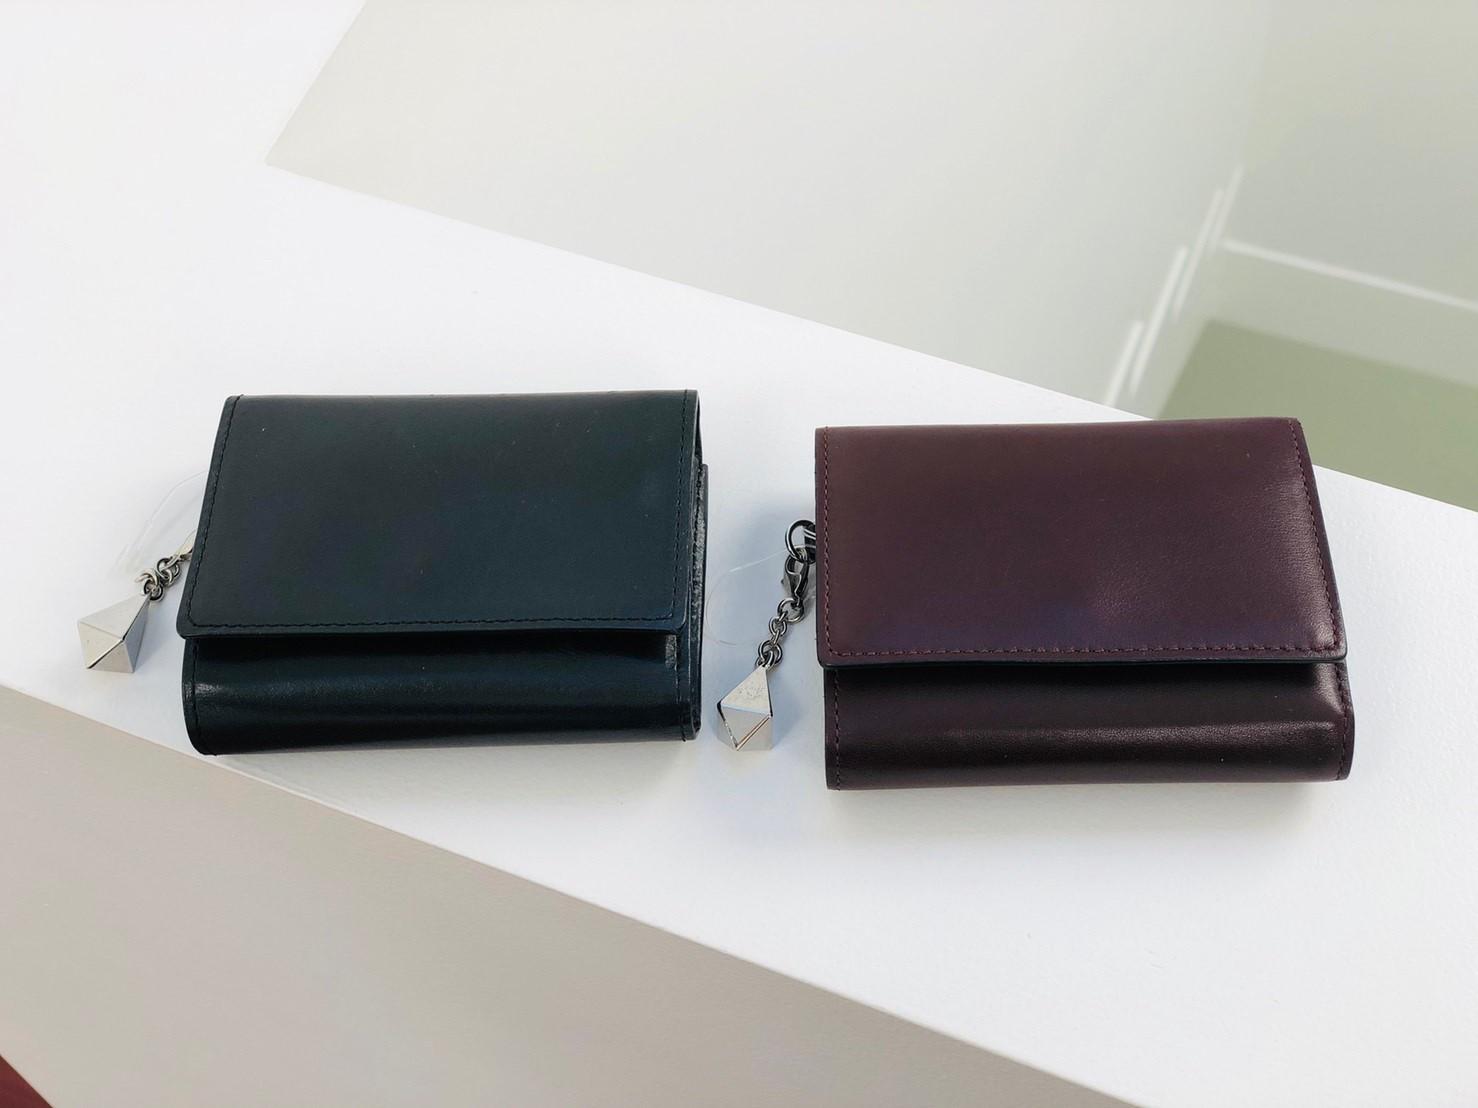 【Epoi本店】冬セール対象商品ご紹介(お財布・革小物)